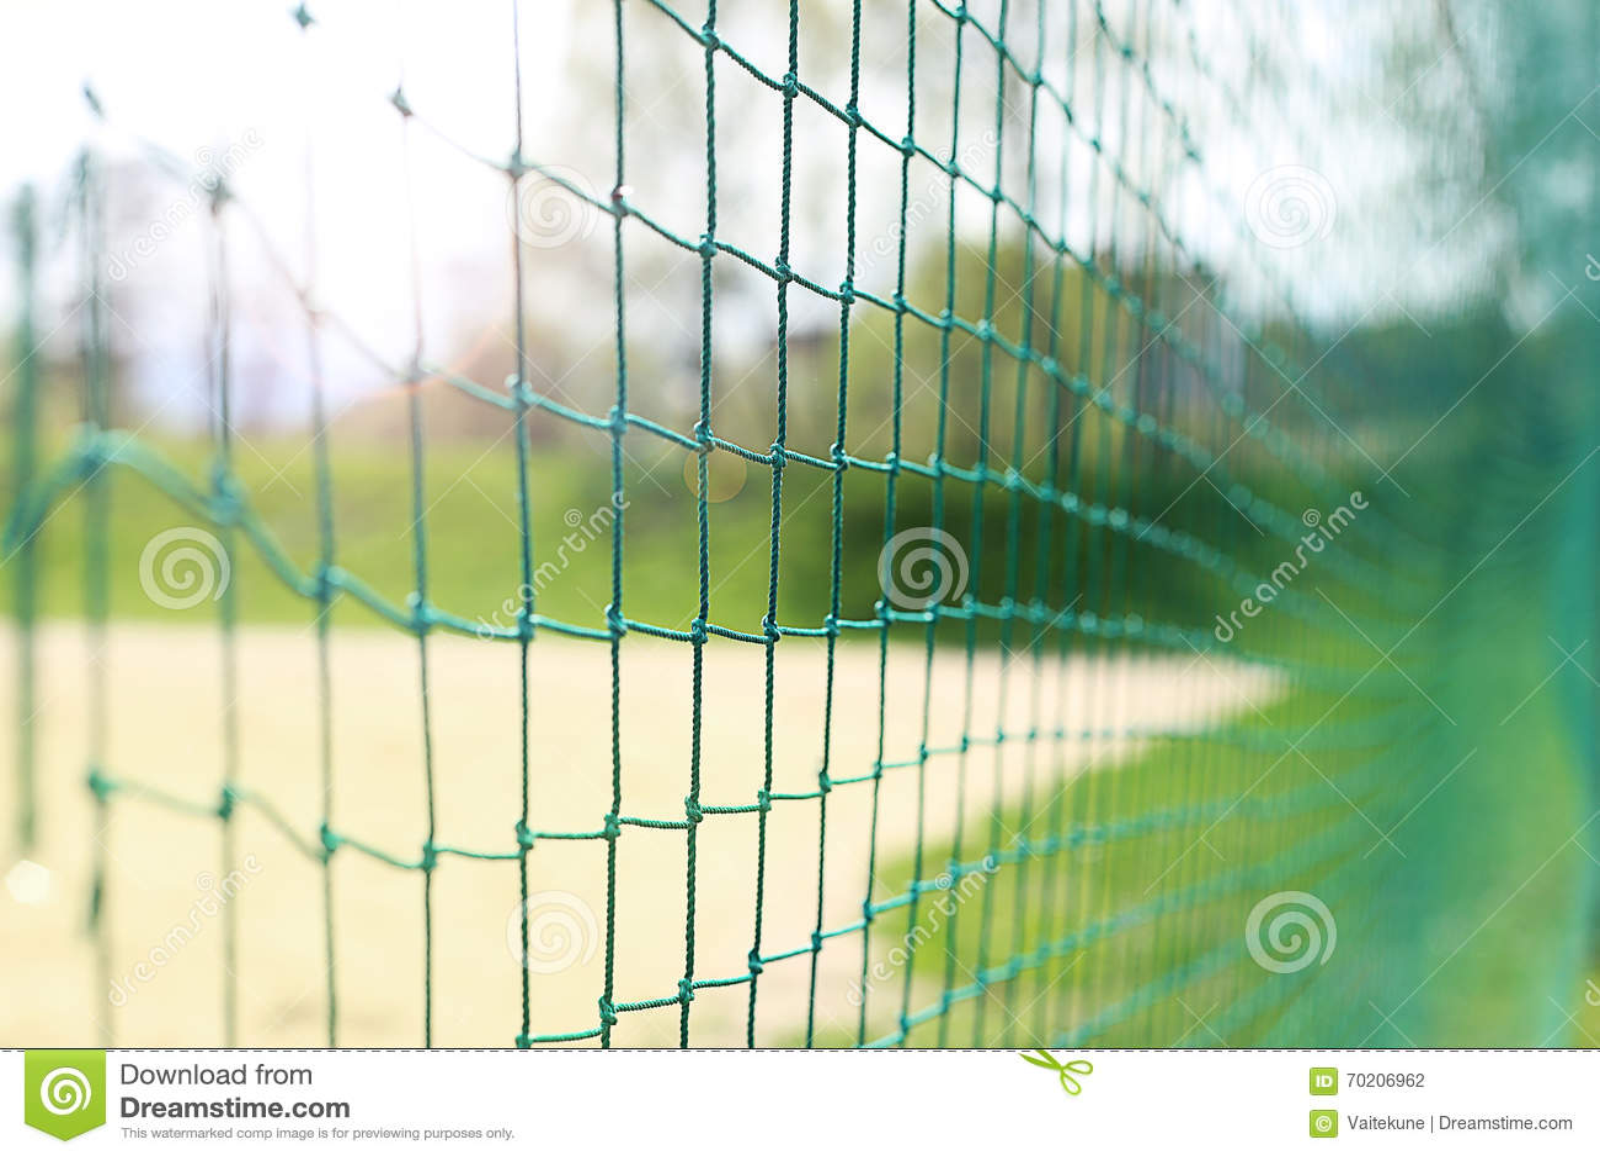 Netto volleyball